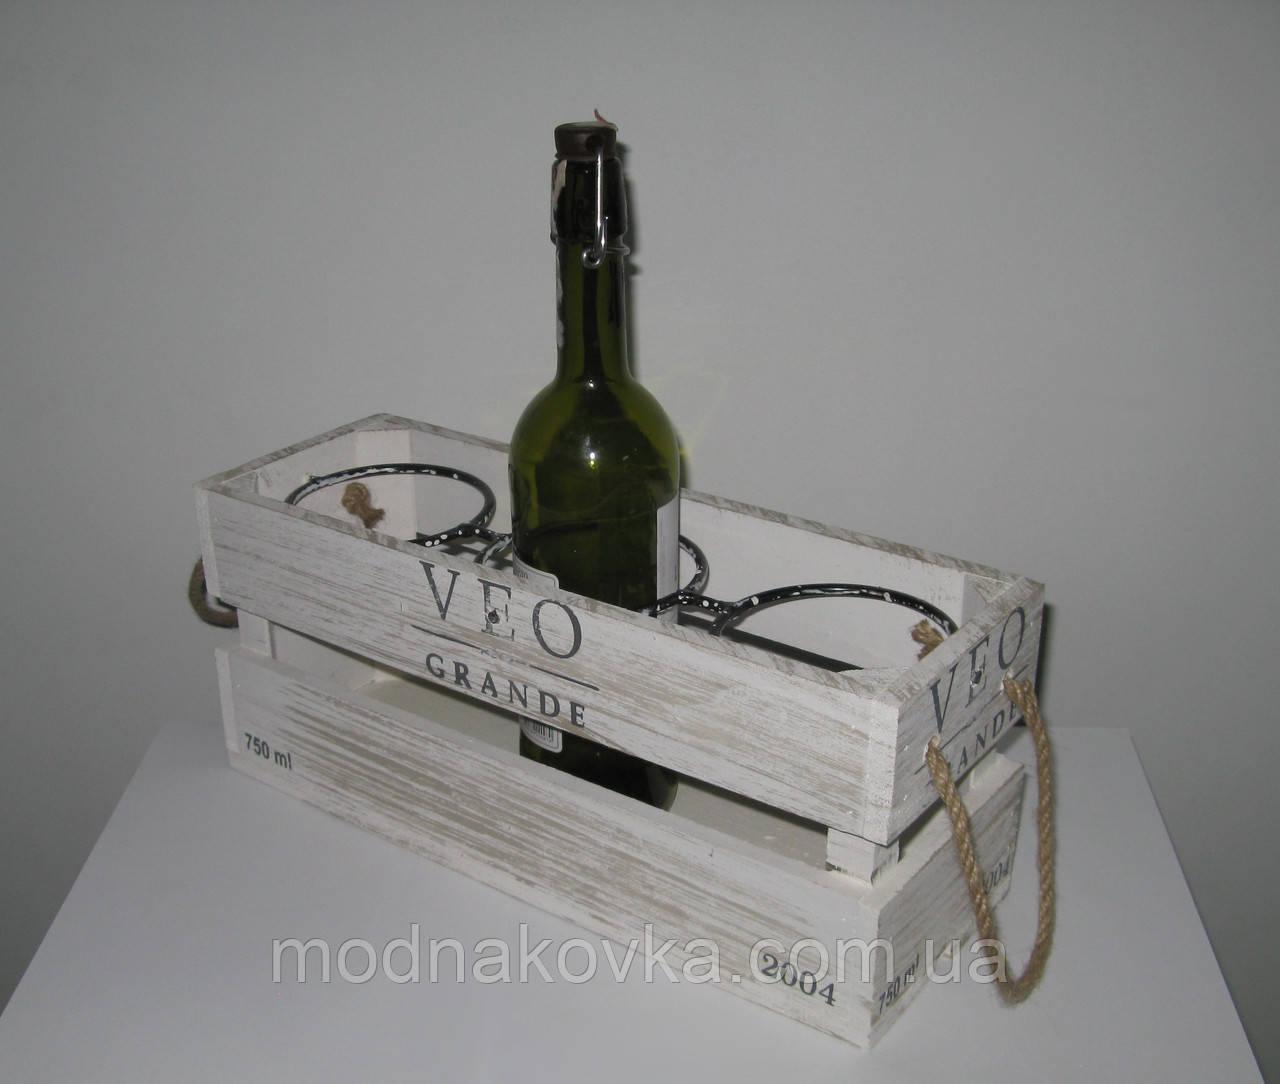 Деревянная подставка для вина - ящик на 3 бутылки